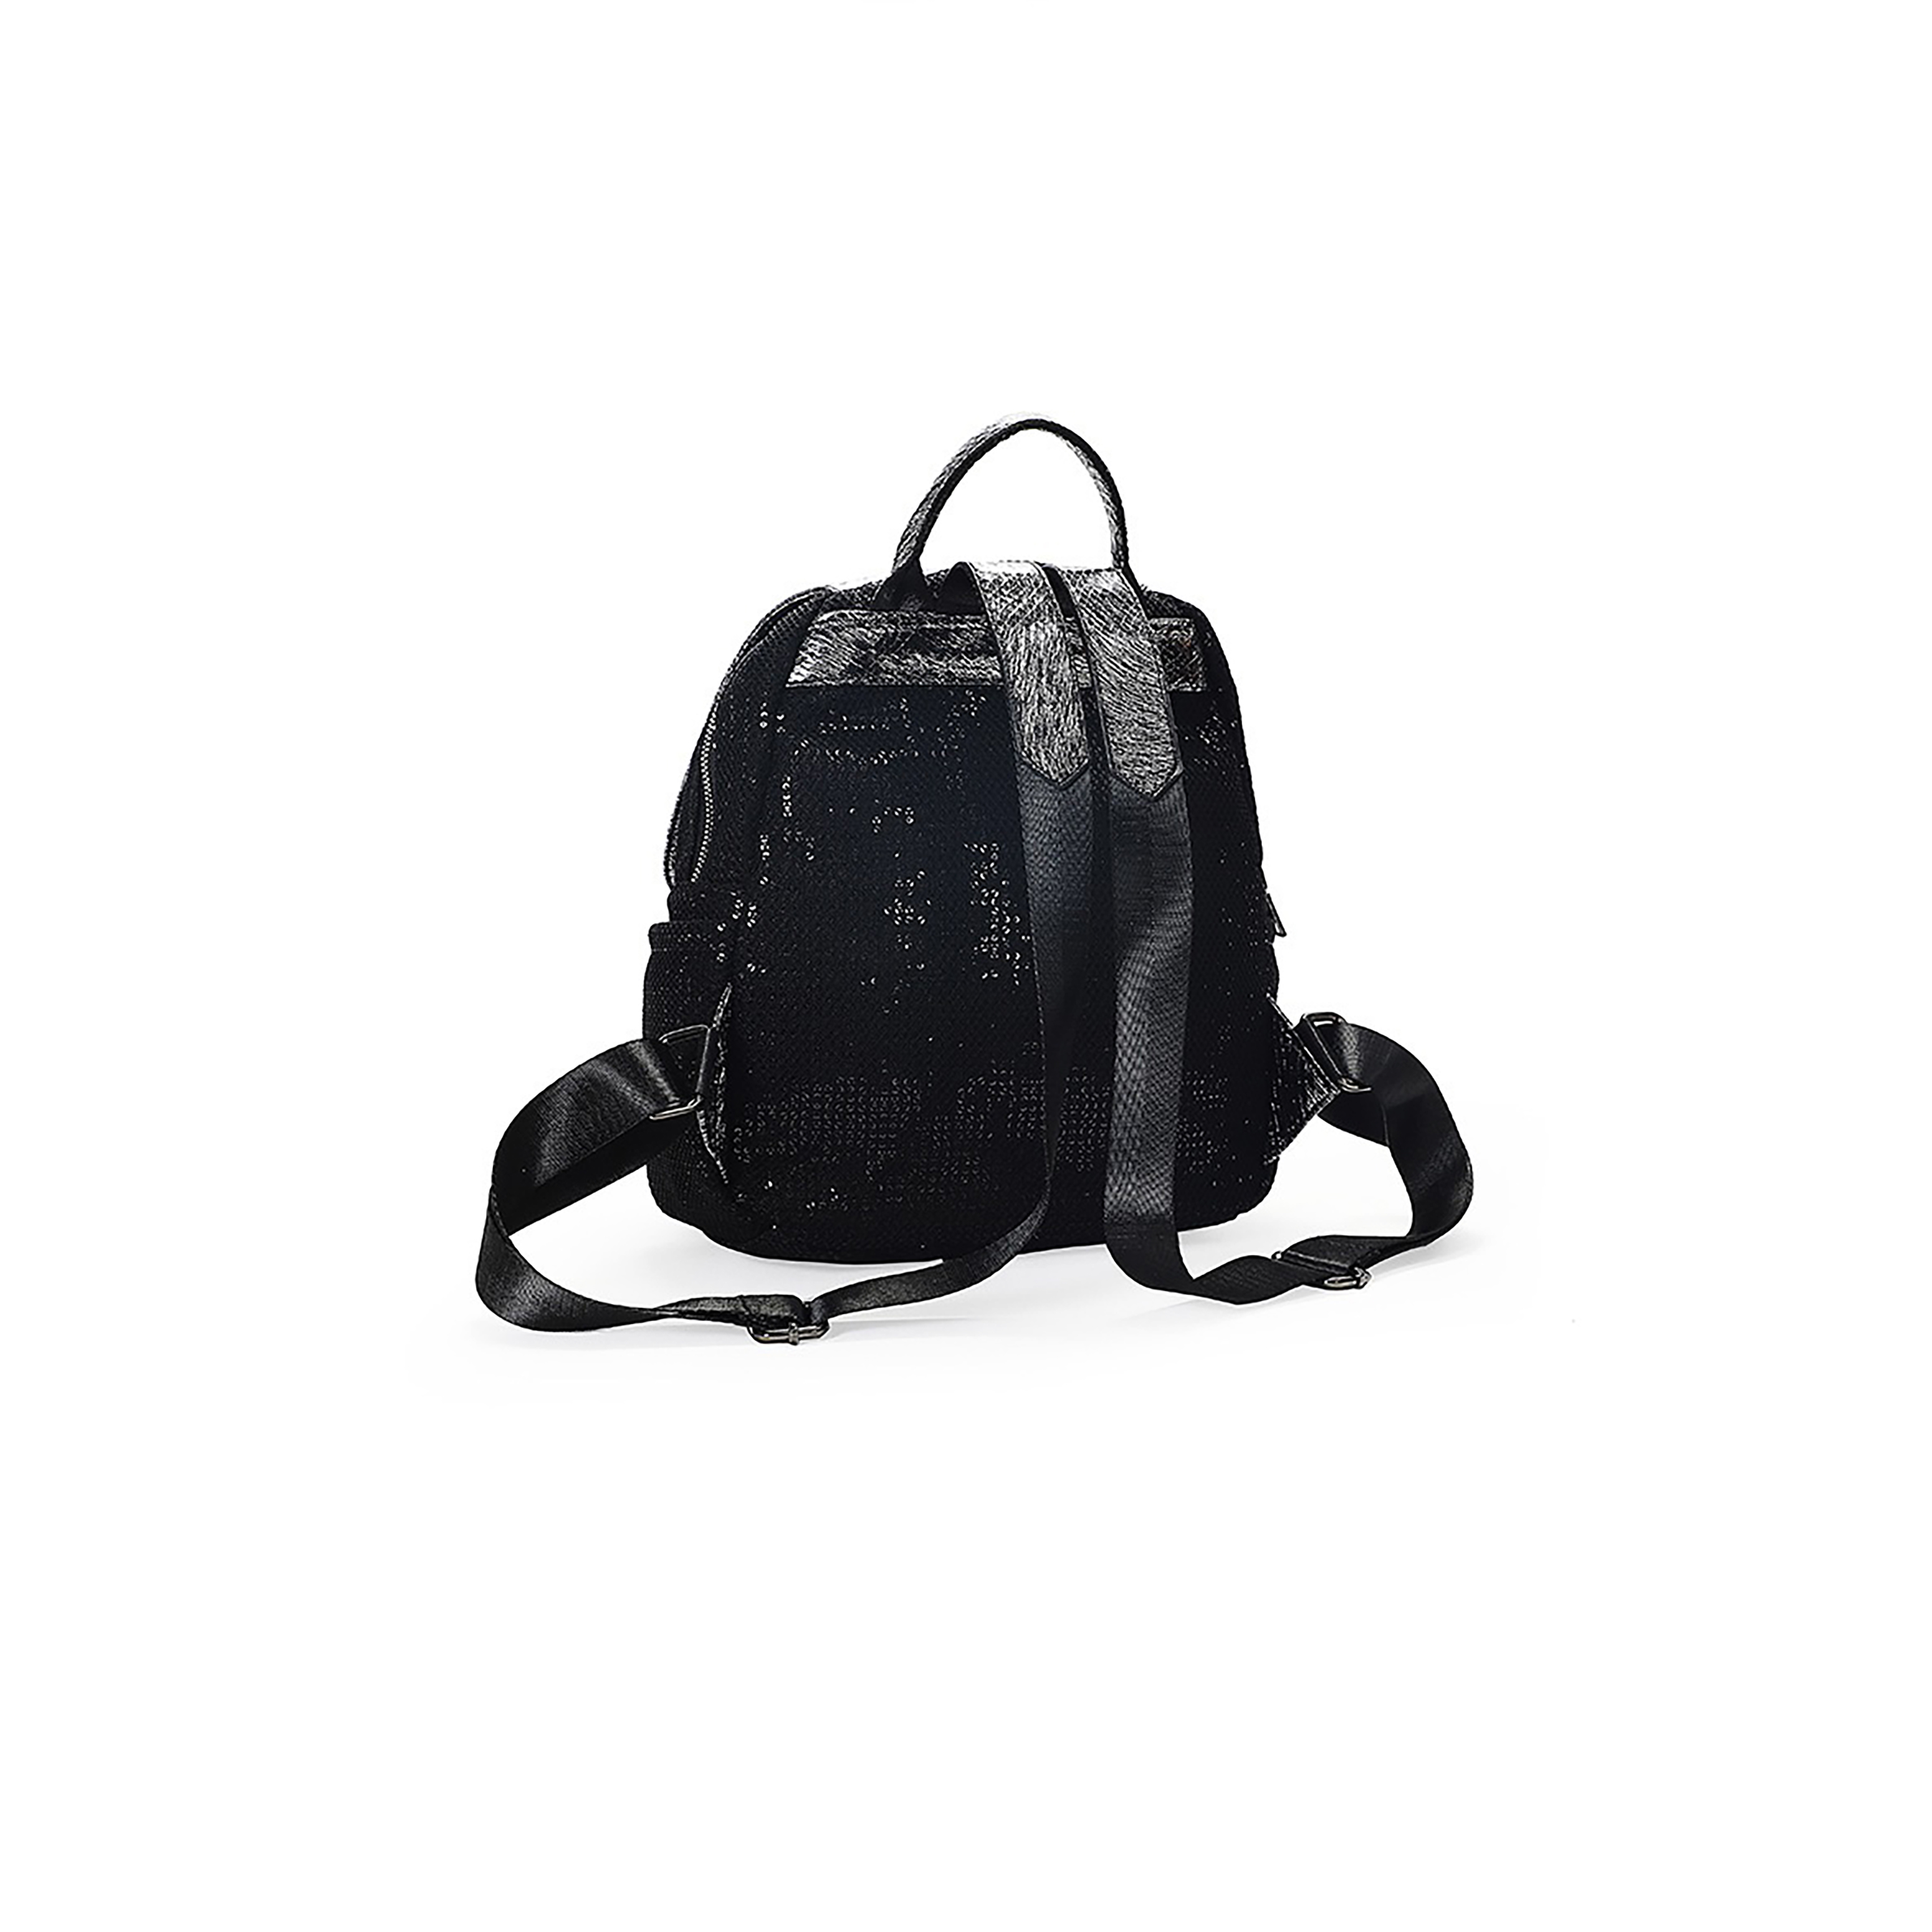 School Backpack Women Bags Backpacks For Teenage College Teenagers Girls Fashion Mesh surface Bagpack Luxury Bags Woman Femeal